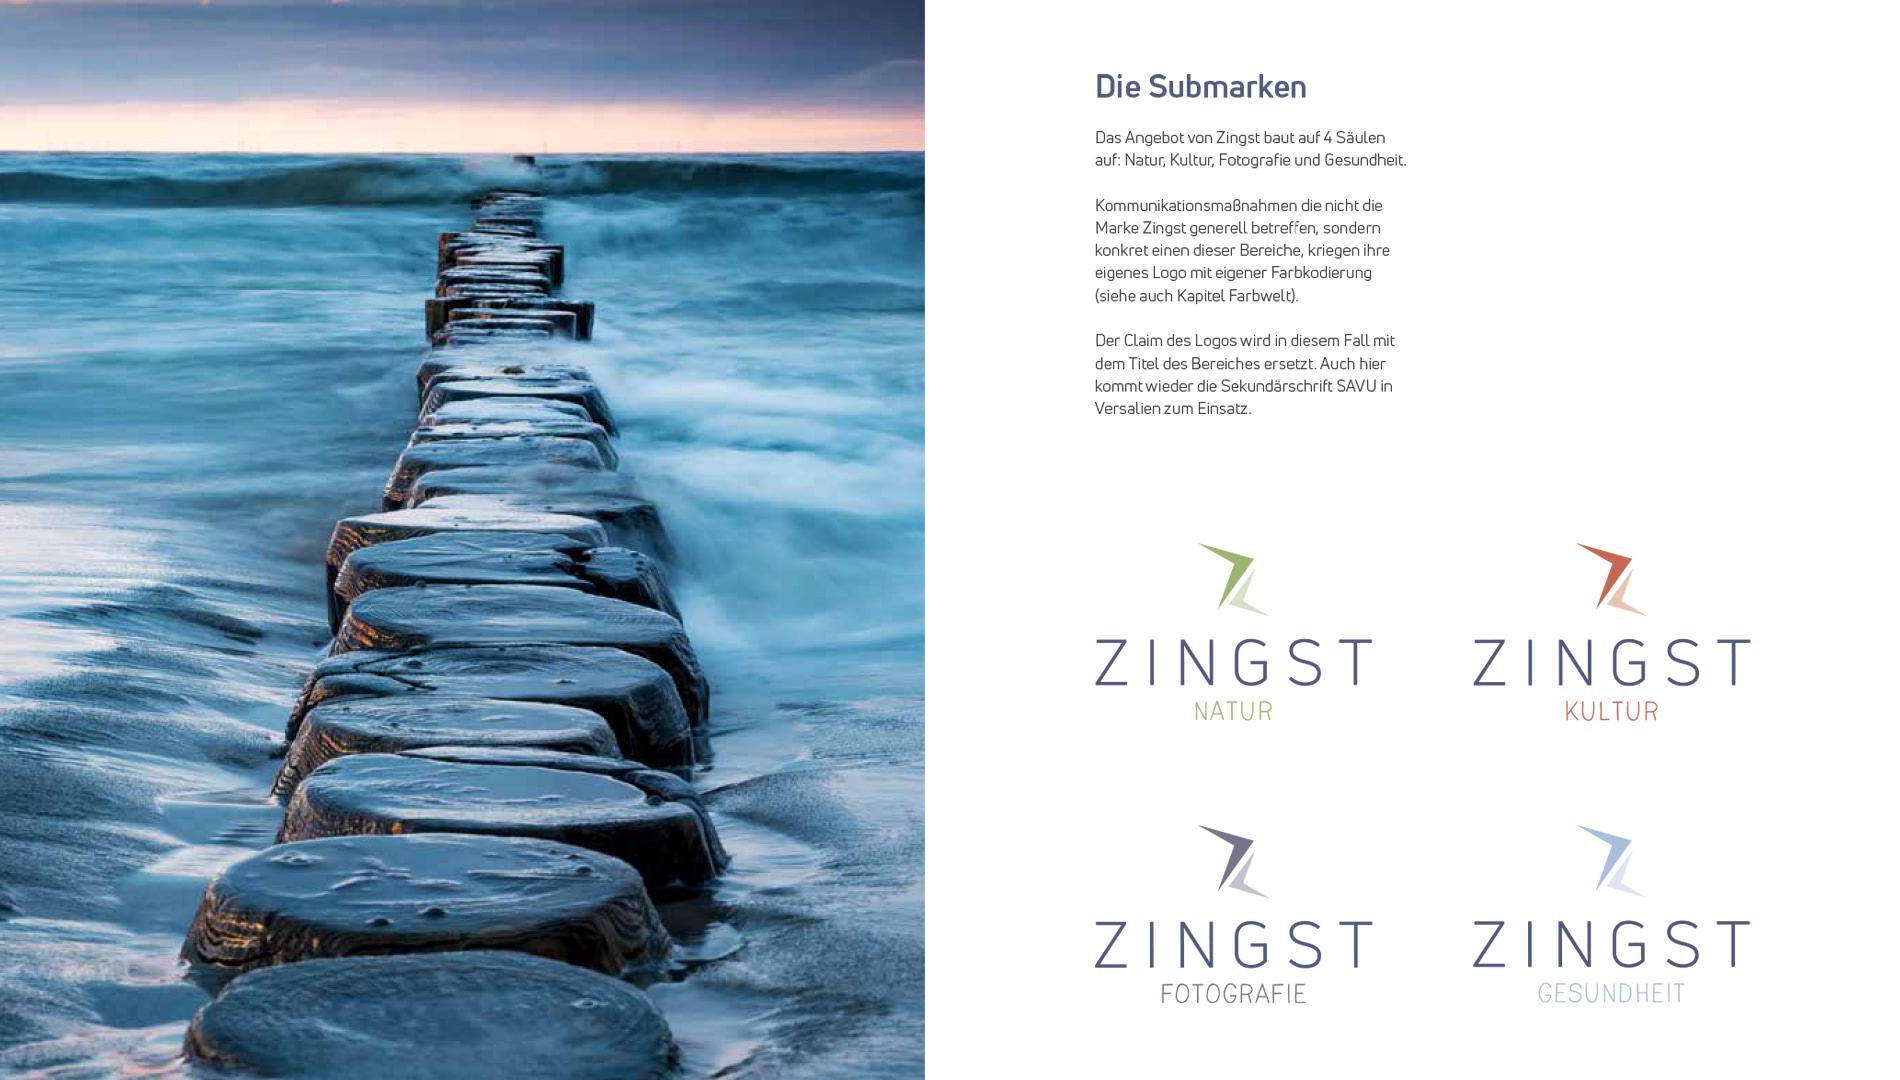 Markenentwicklung Corporate Design Zingst Submarken Going Places